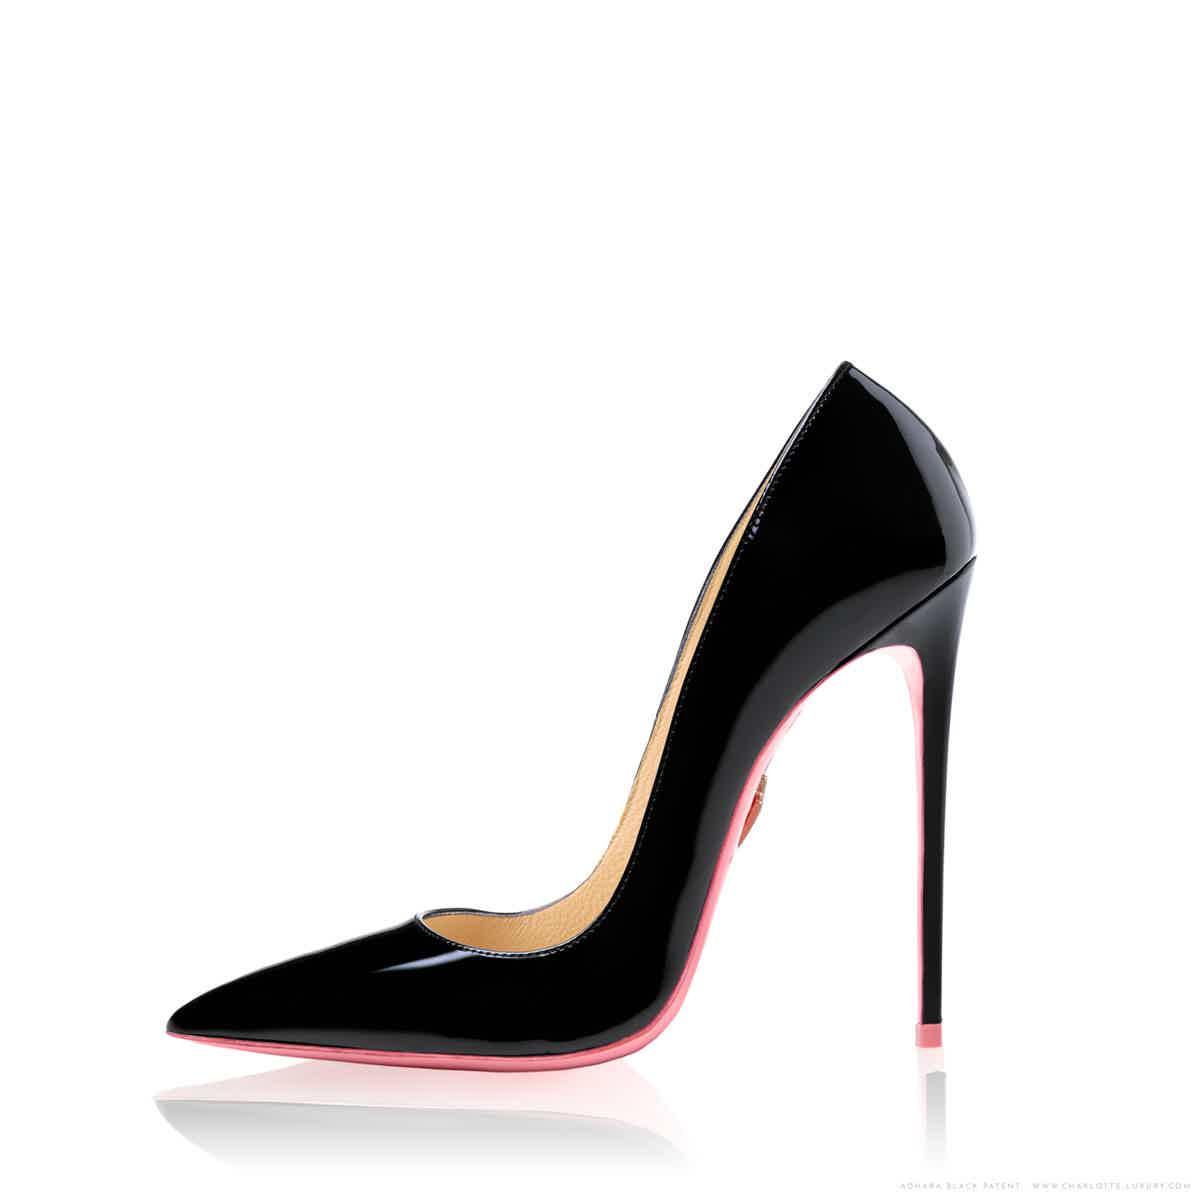 a704e4a10d3f4 Charlotte Luxury · High Heel Shoes   Boots · Custom Made